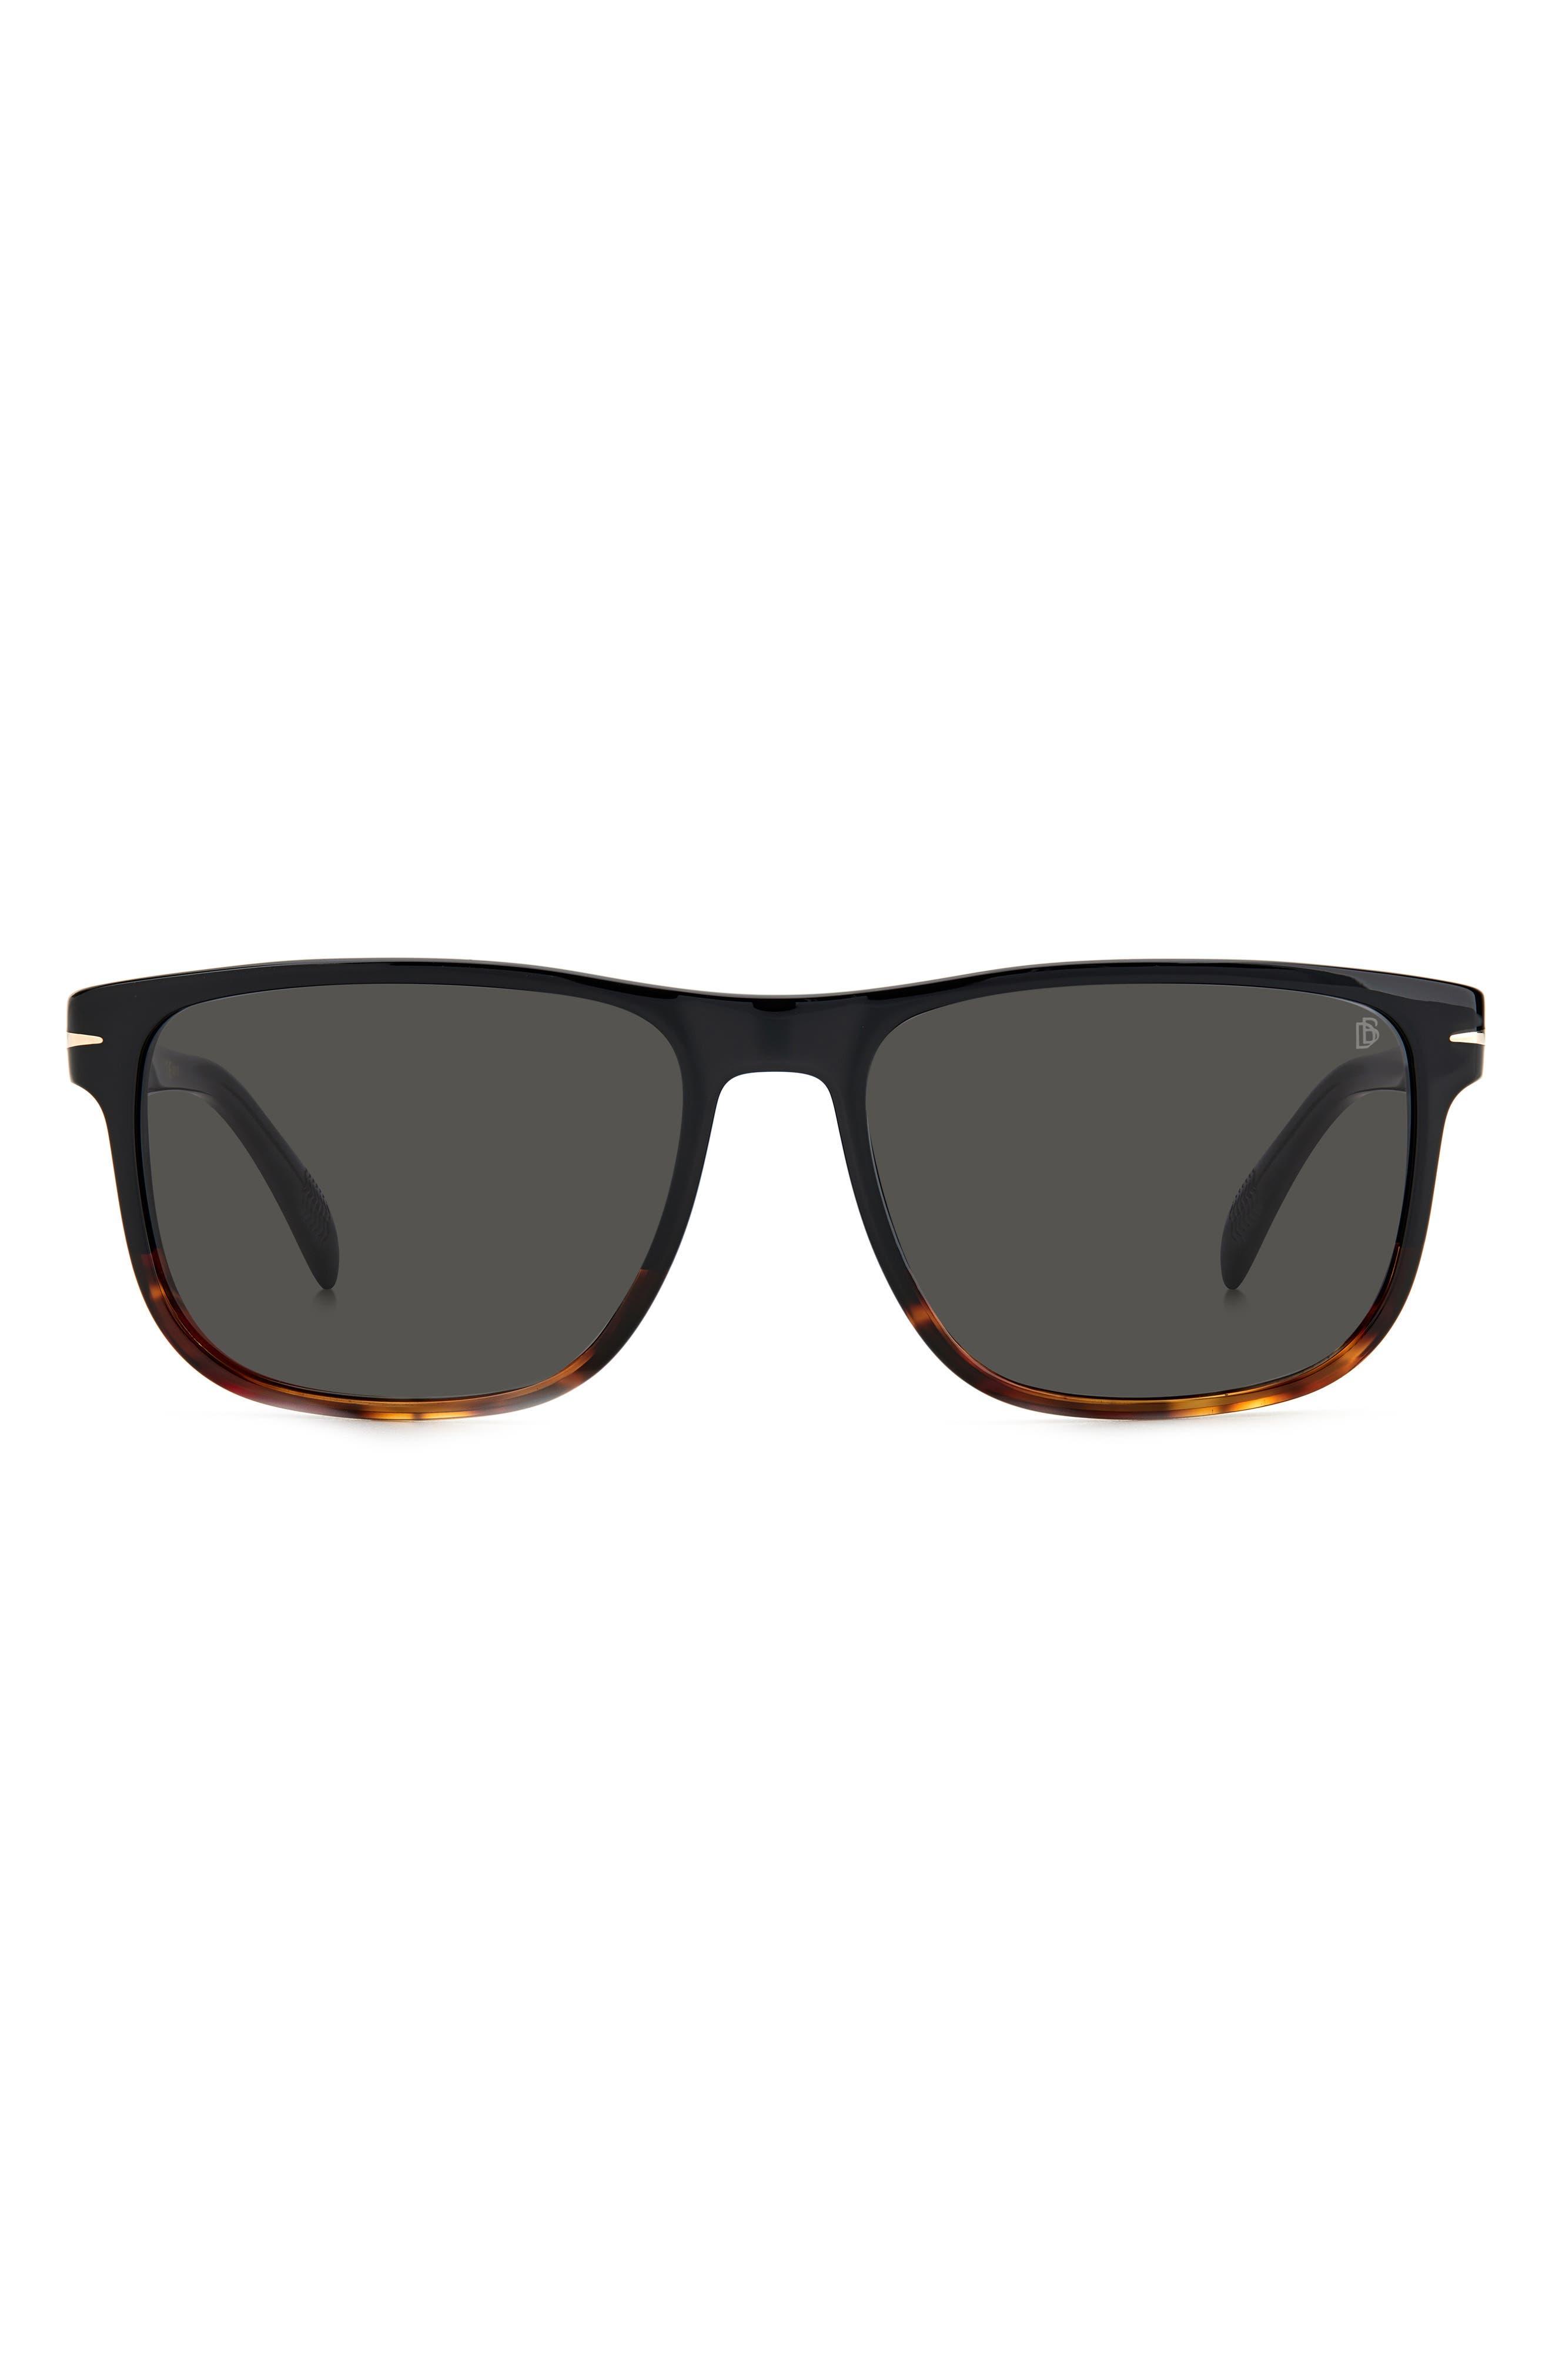 57mm Polarized Rectangular Sunglasses